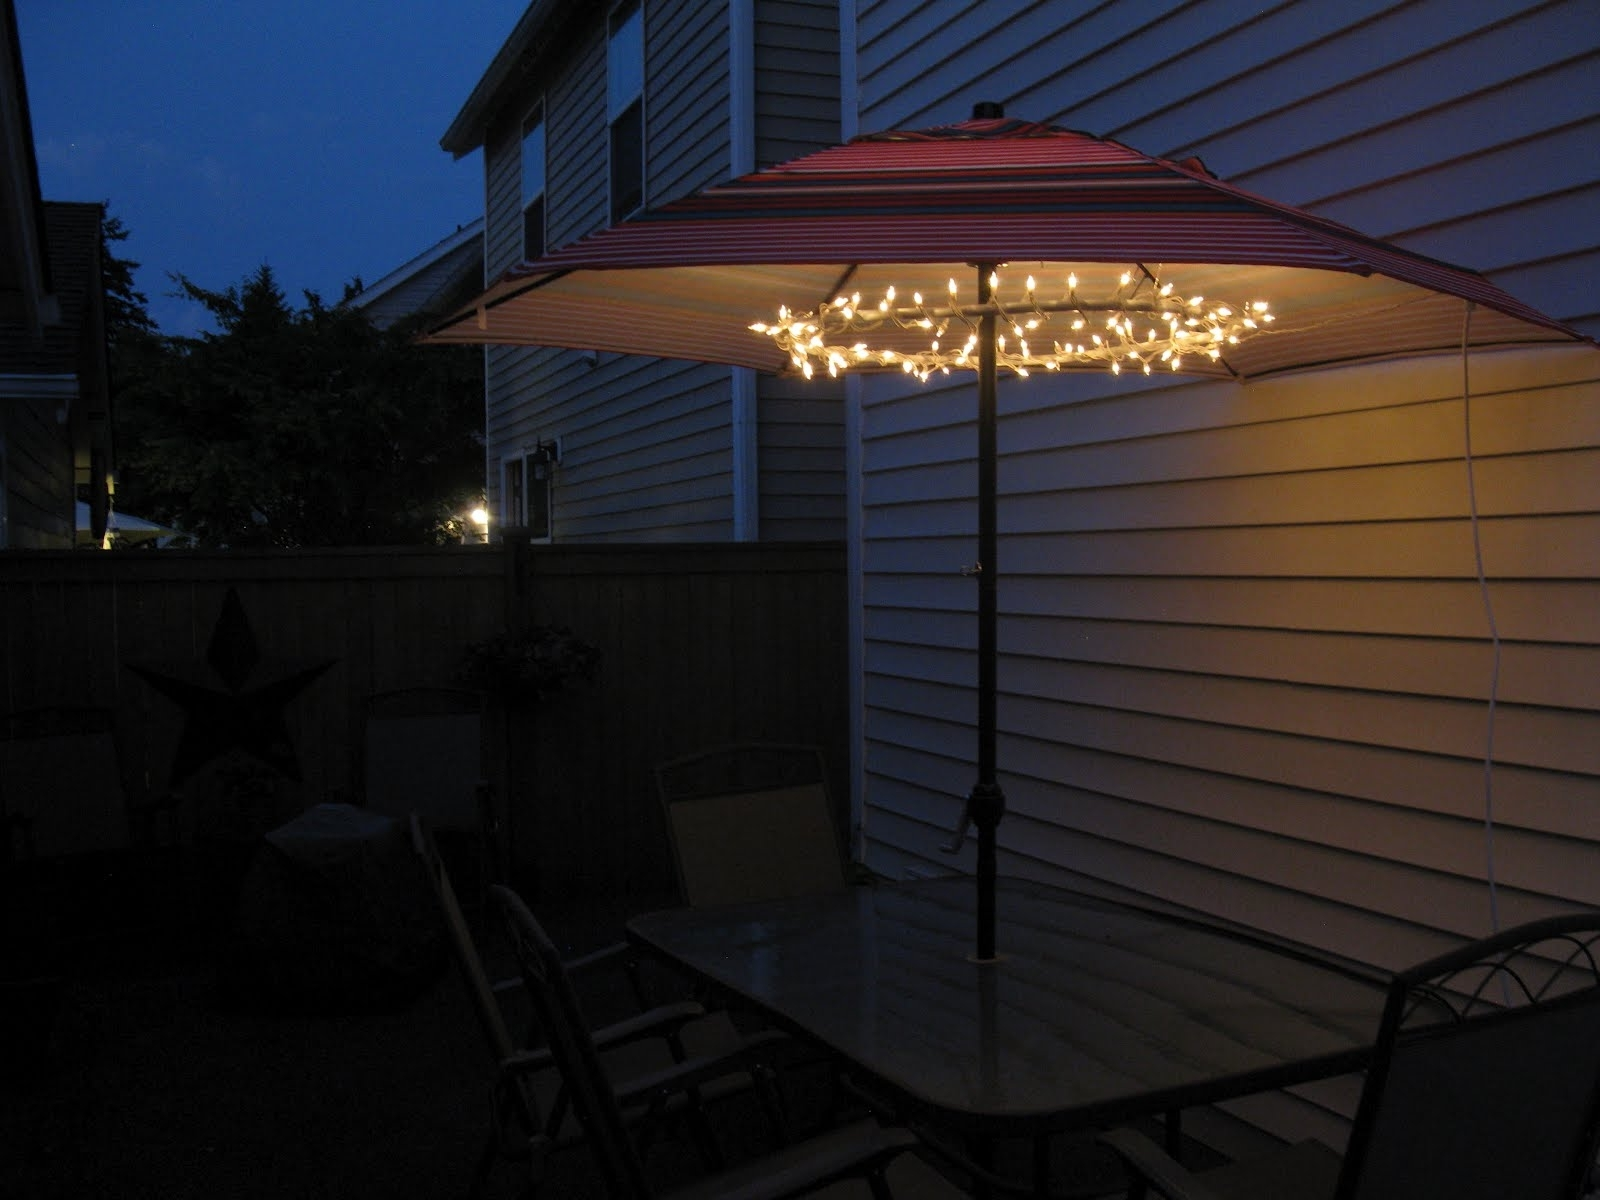 Popular Patio Umbrella Lights Throughout Amazing Patio Umbrella Lights — Wilson Home Ideas : Beautiful Patio (View 6 of 20)